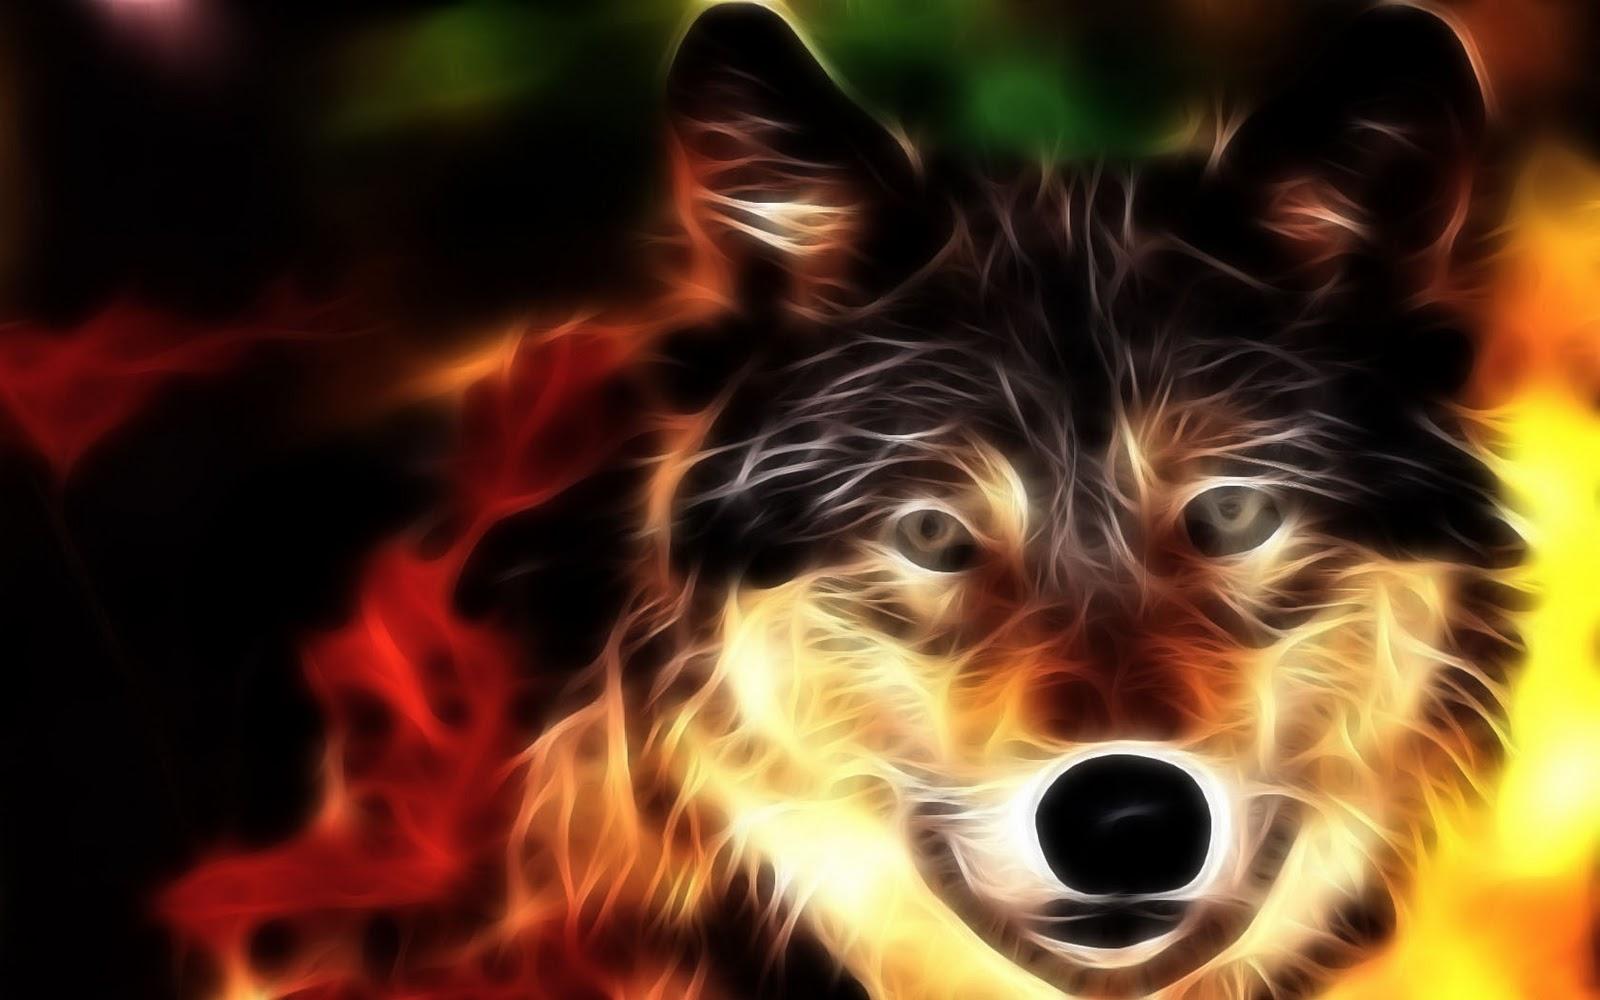 http://4.bp.blogspot.com/-XOUV5tBfcEE/TwC3kcXTV0I/AAAAAAAAAJo/WUE4dIiibPw/s1600/animal+wallpapers+%25282%2529.jpg